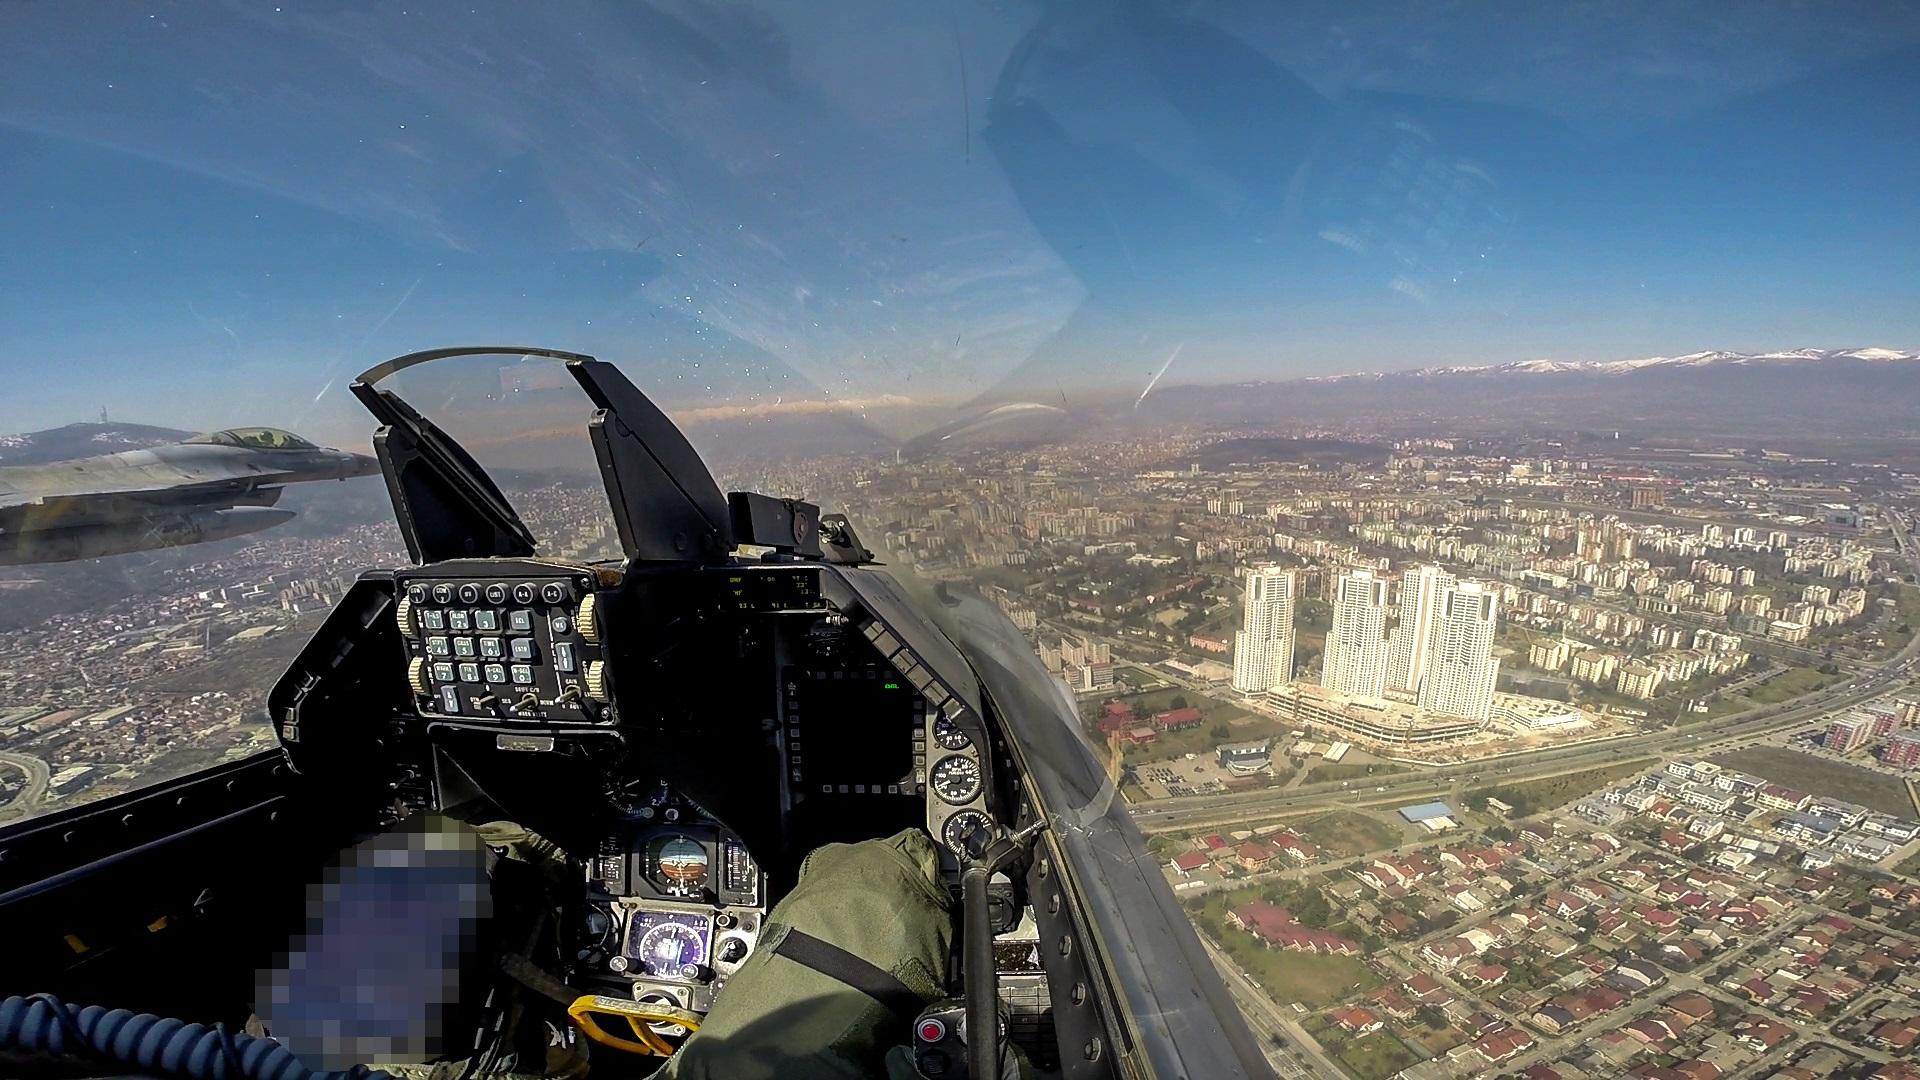 NATO: Ελληνικά F-16 πέταξαν πάνω από τα Σκόπια στις εορταστικές εκδηλώσεις της χώρας